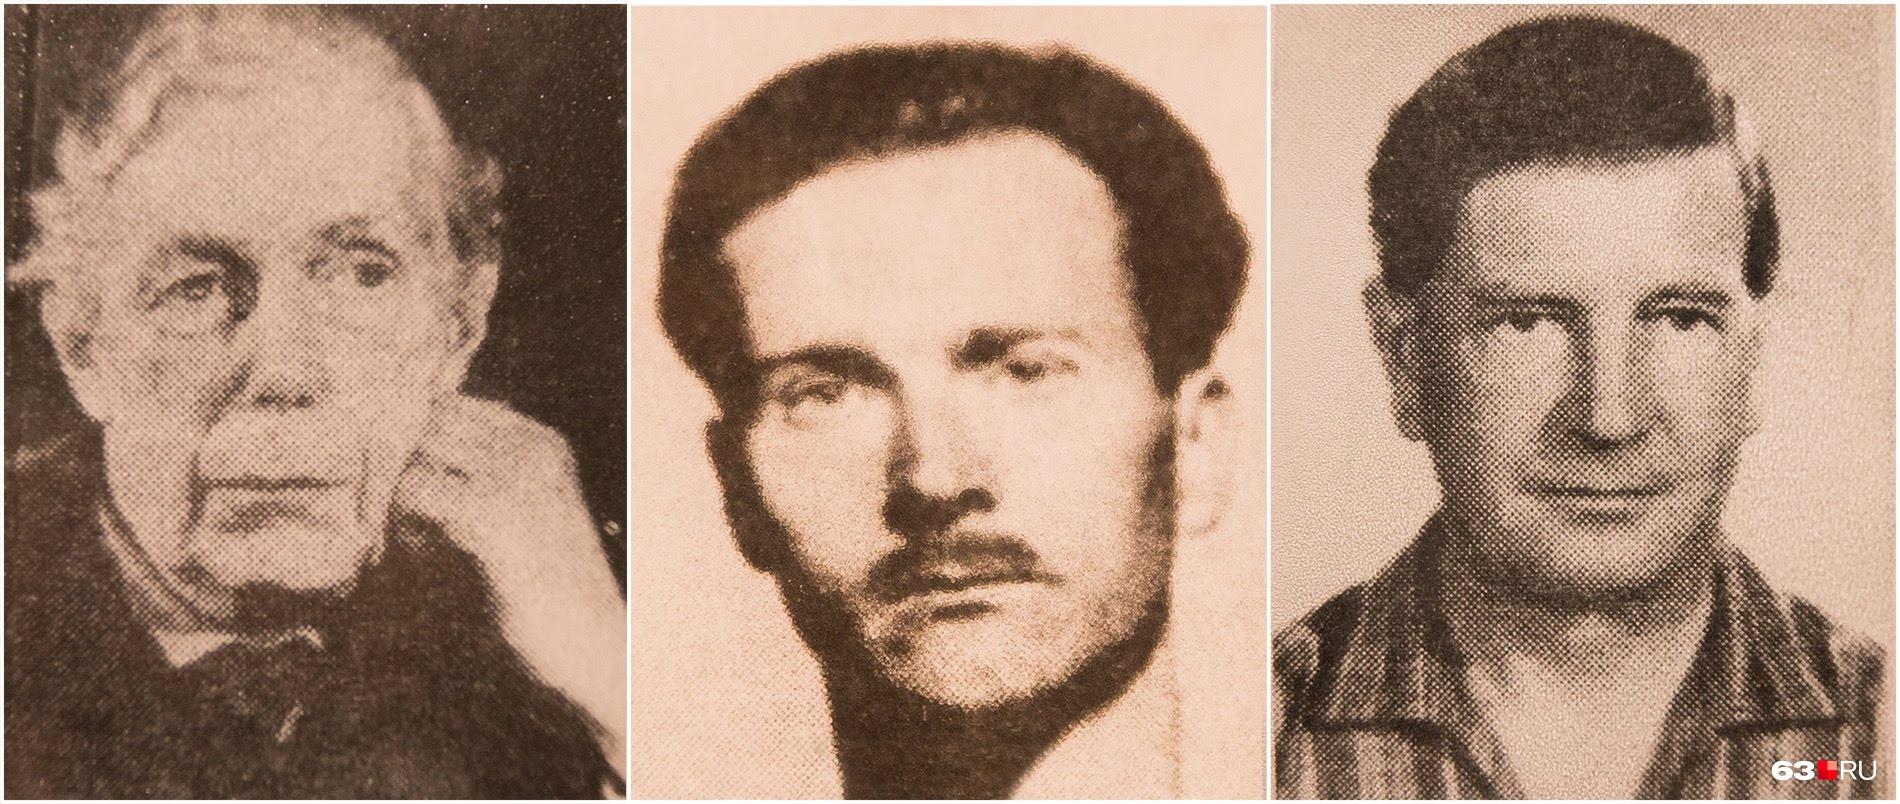 Коллеги куйбышевских англичан: Энтони Блант, Джон Кернкросс и Ким Филби